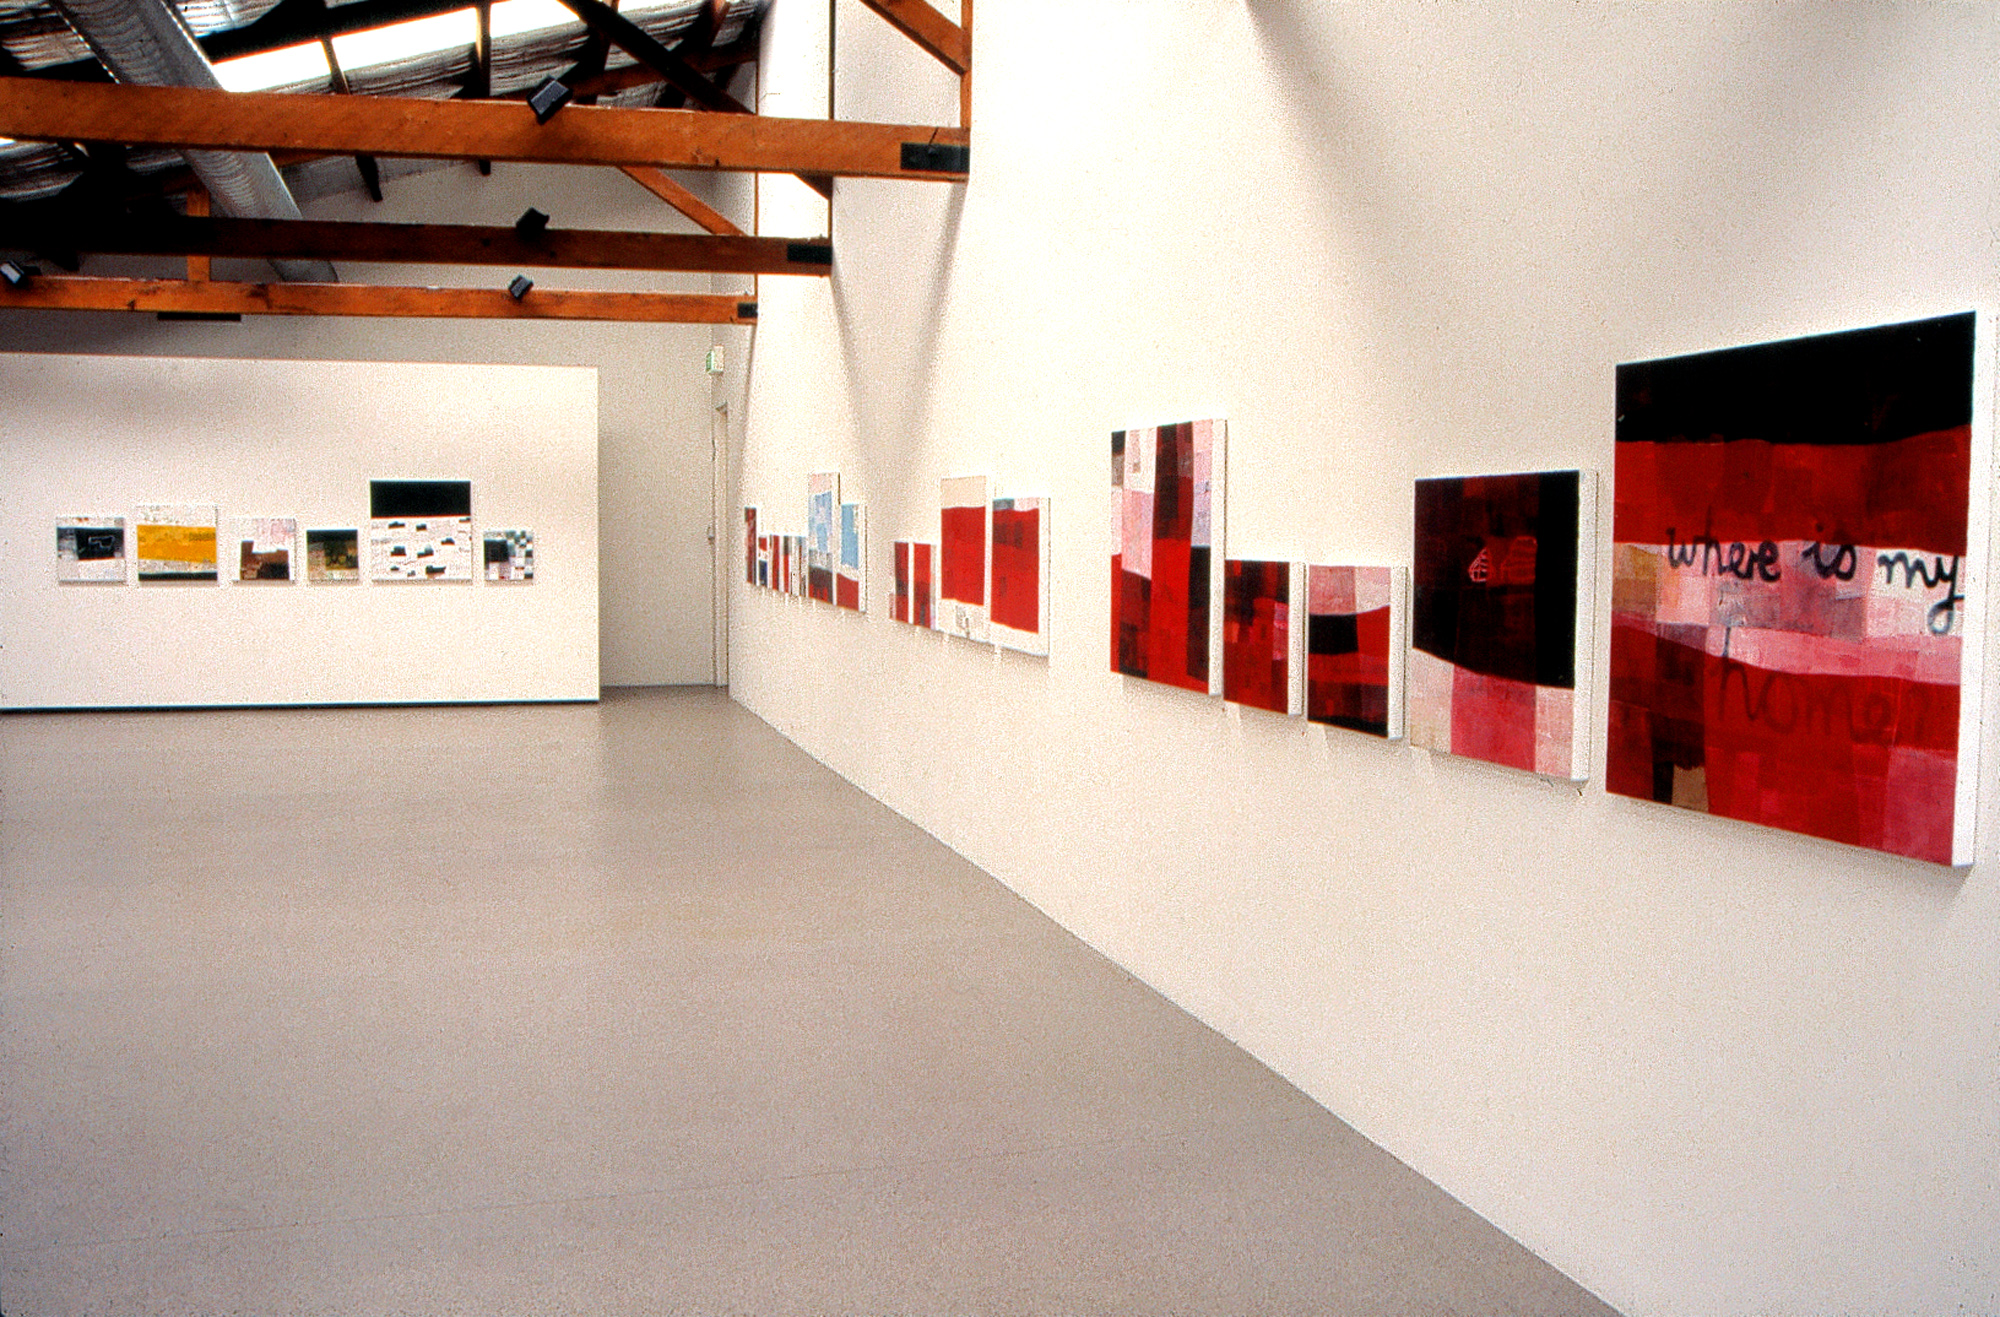 00_mark-gerada_where-is-my-home-exhibition.jpg